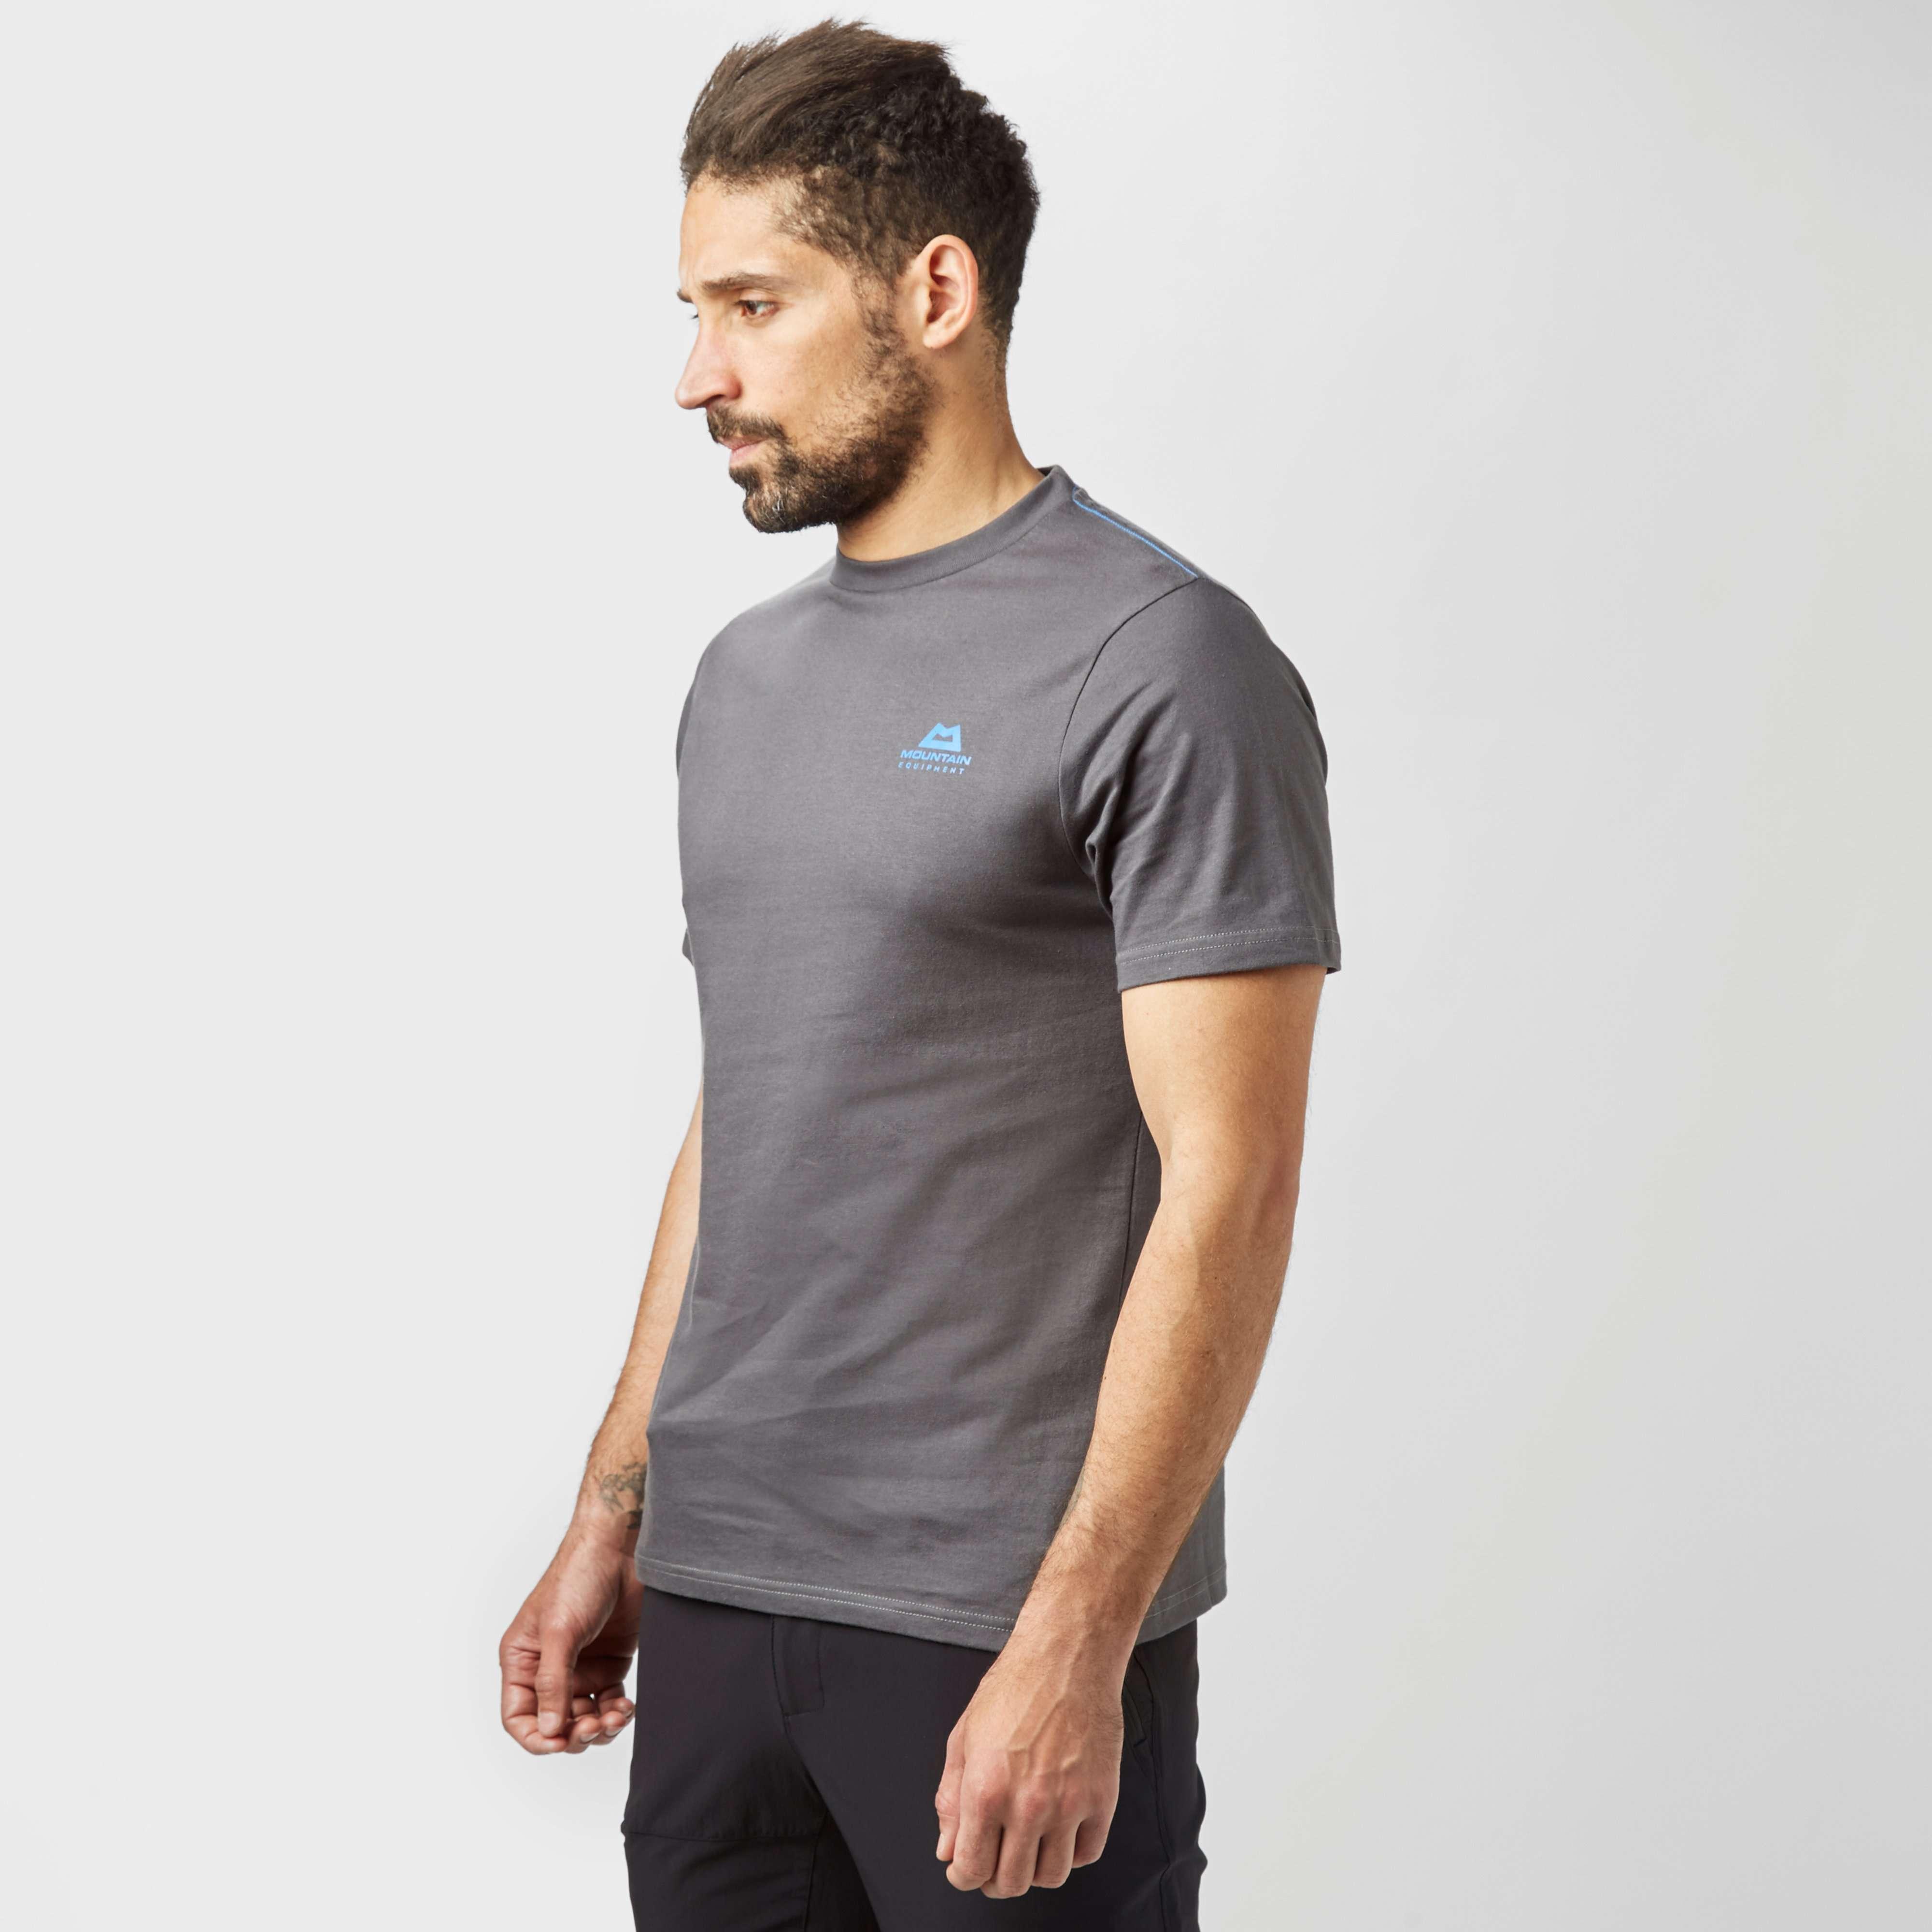 MOUNTAIN EQUIPMENT Men's Back Logo T-Shirt